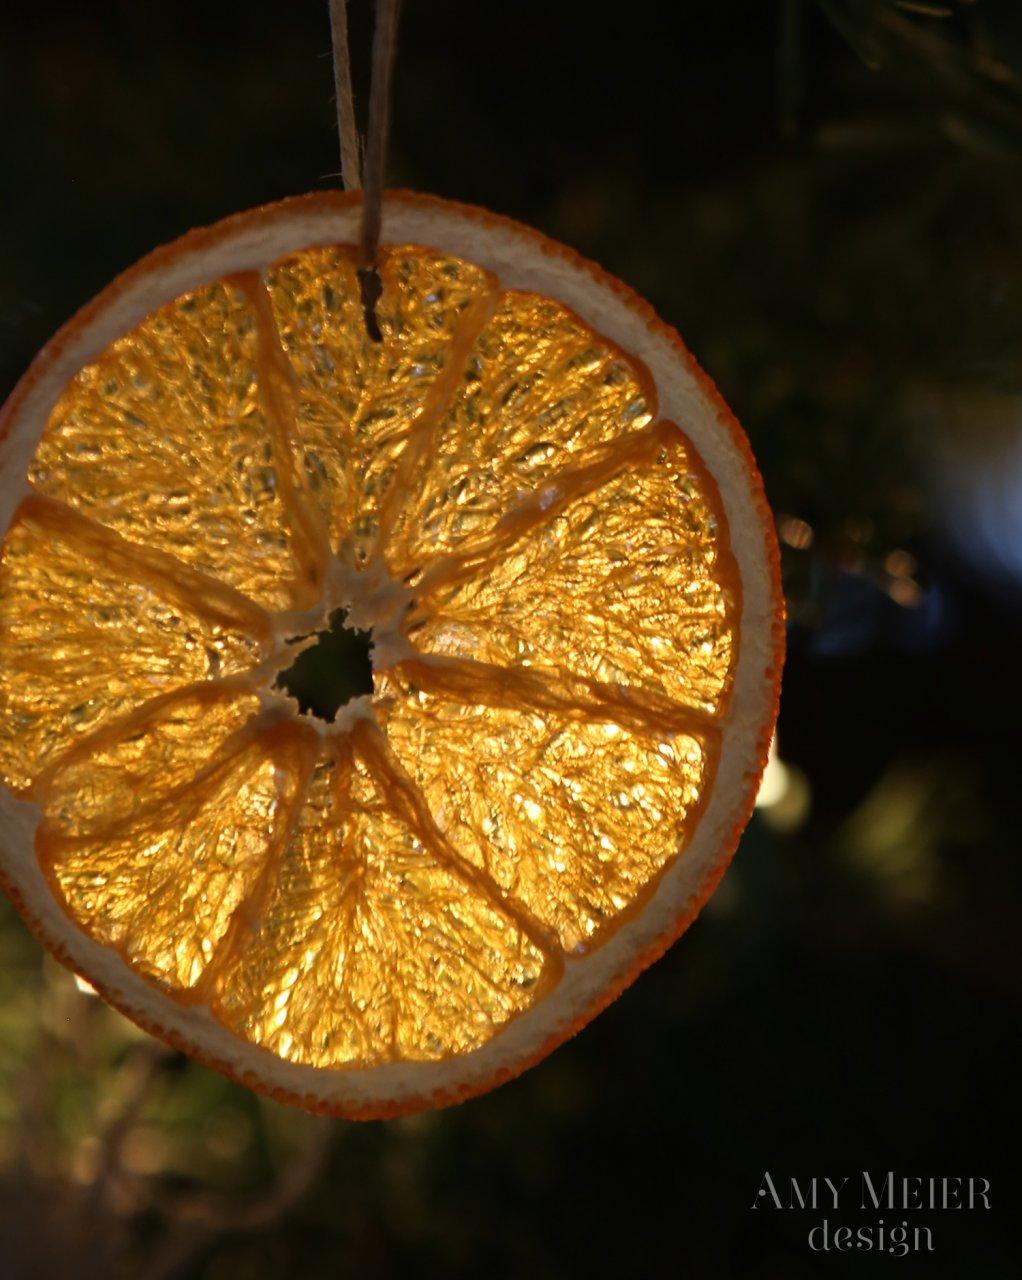 AmyMeierDesign_Xmas_oranges